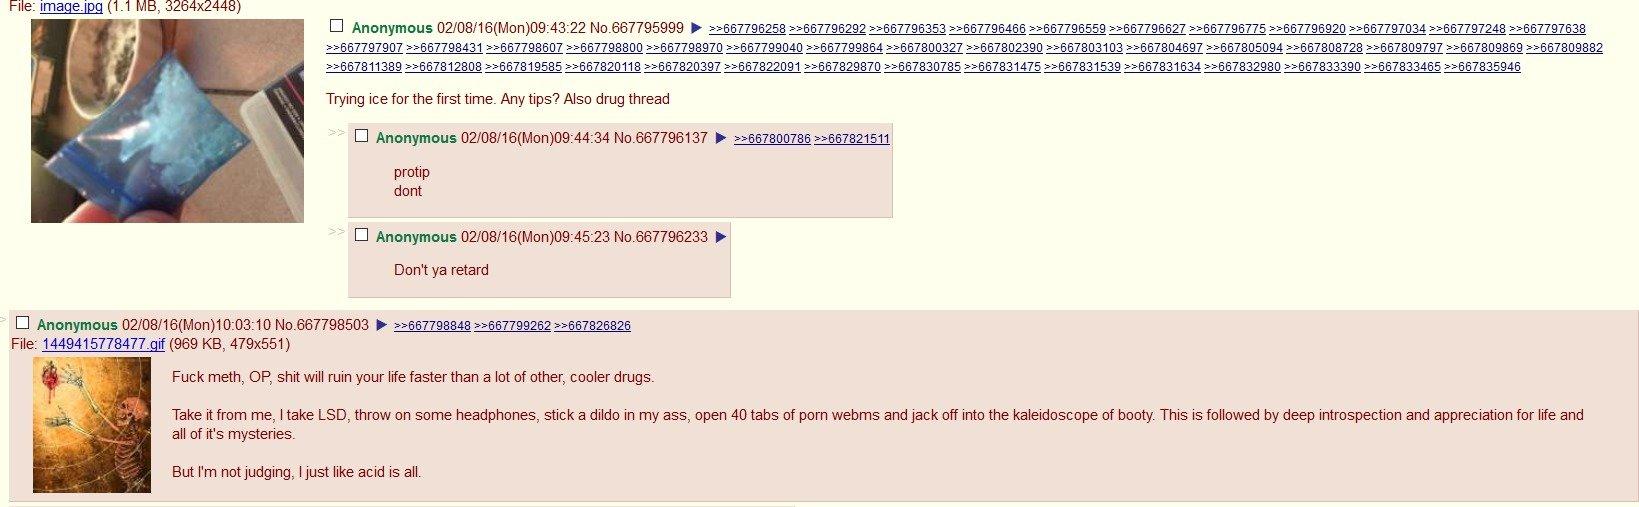 Oblivion hentai mania